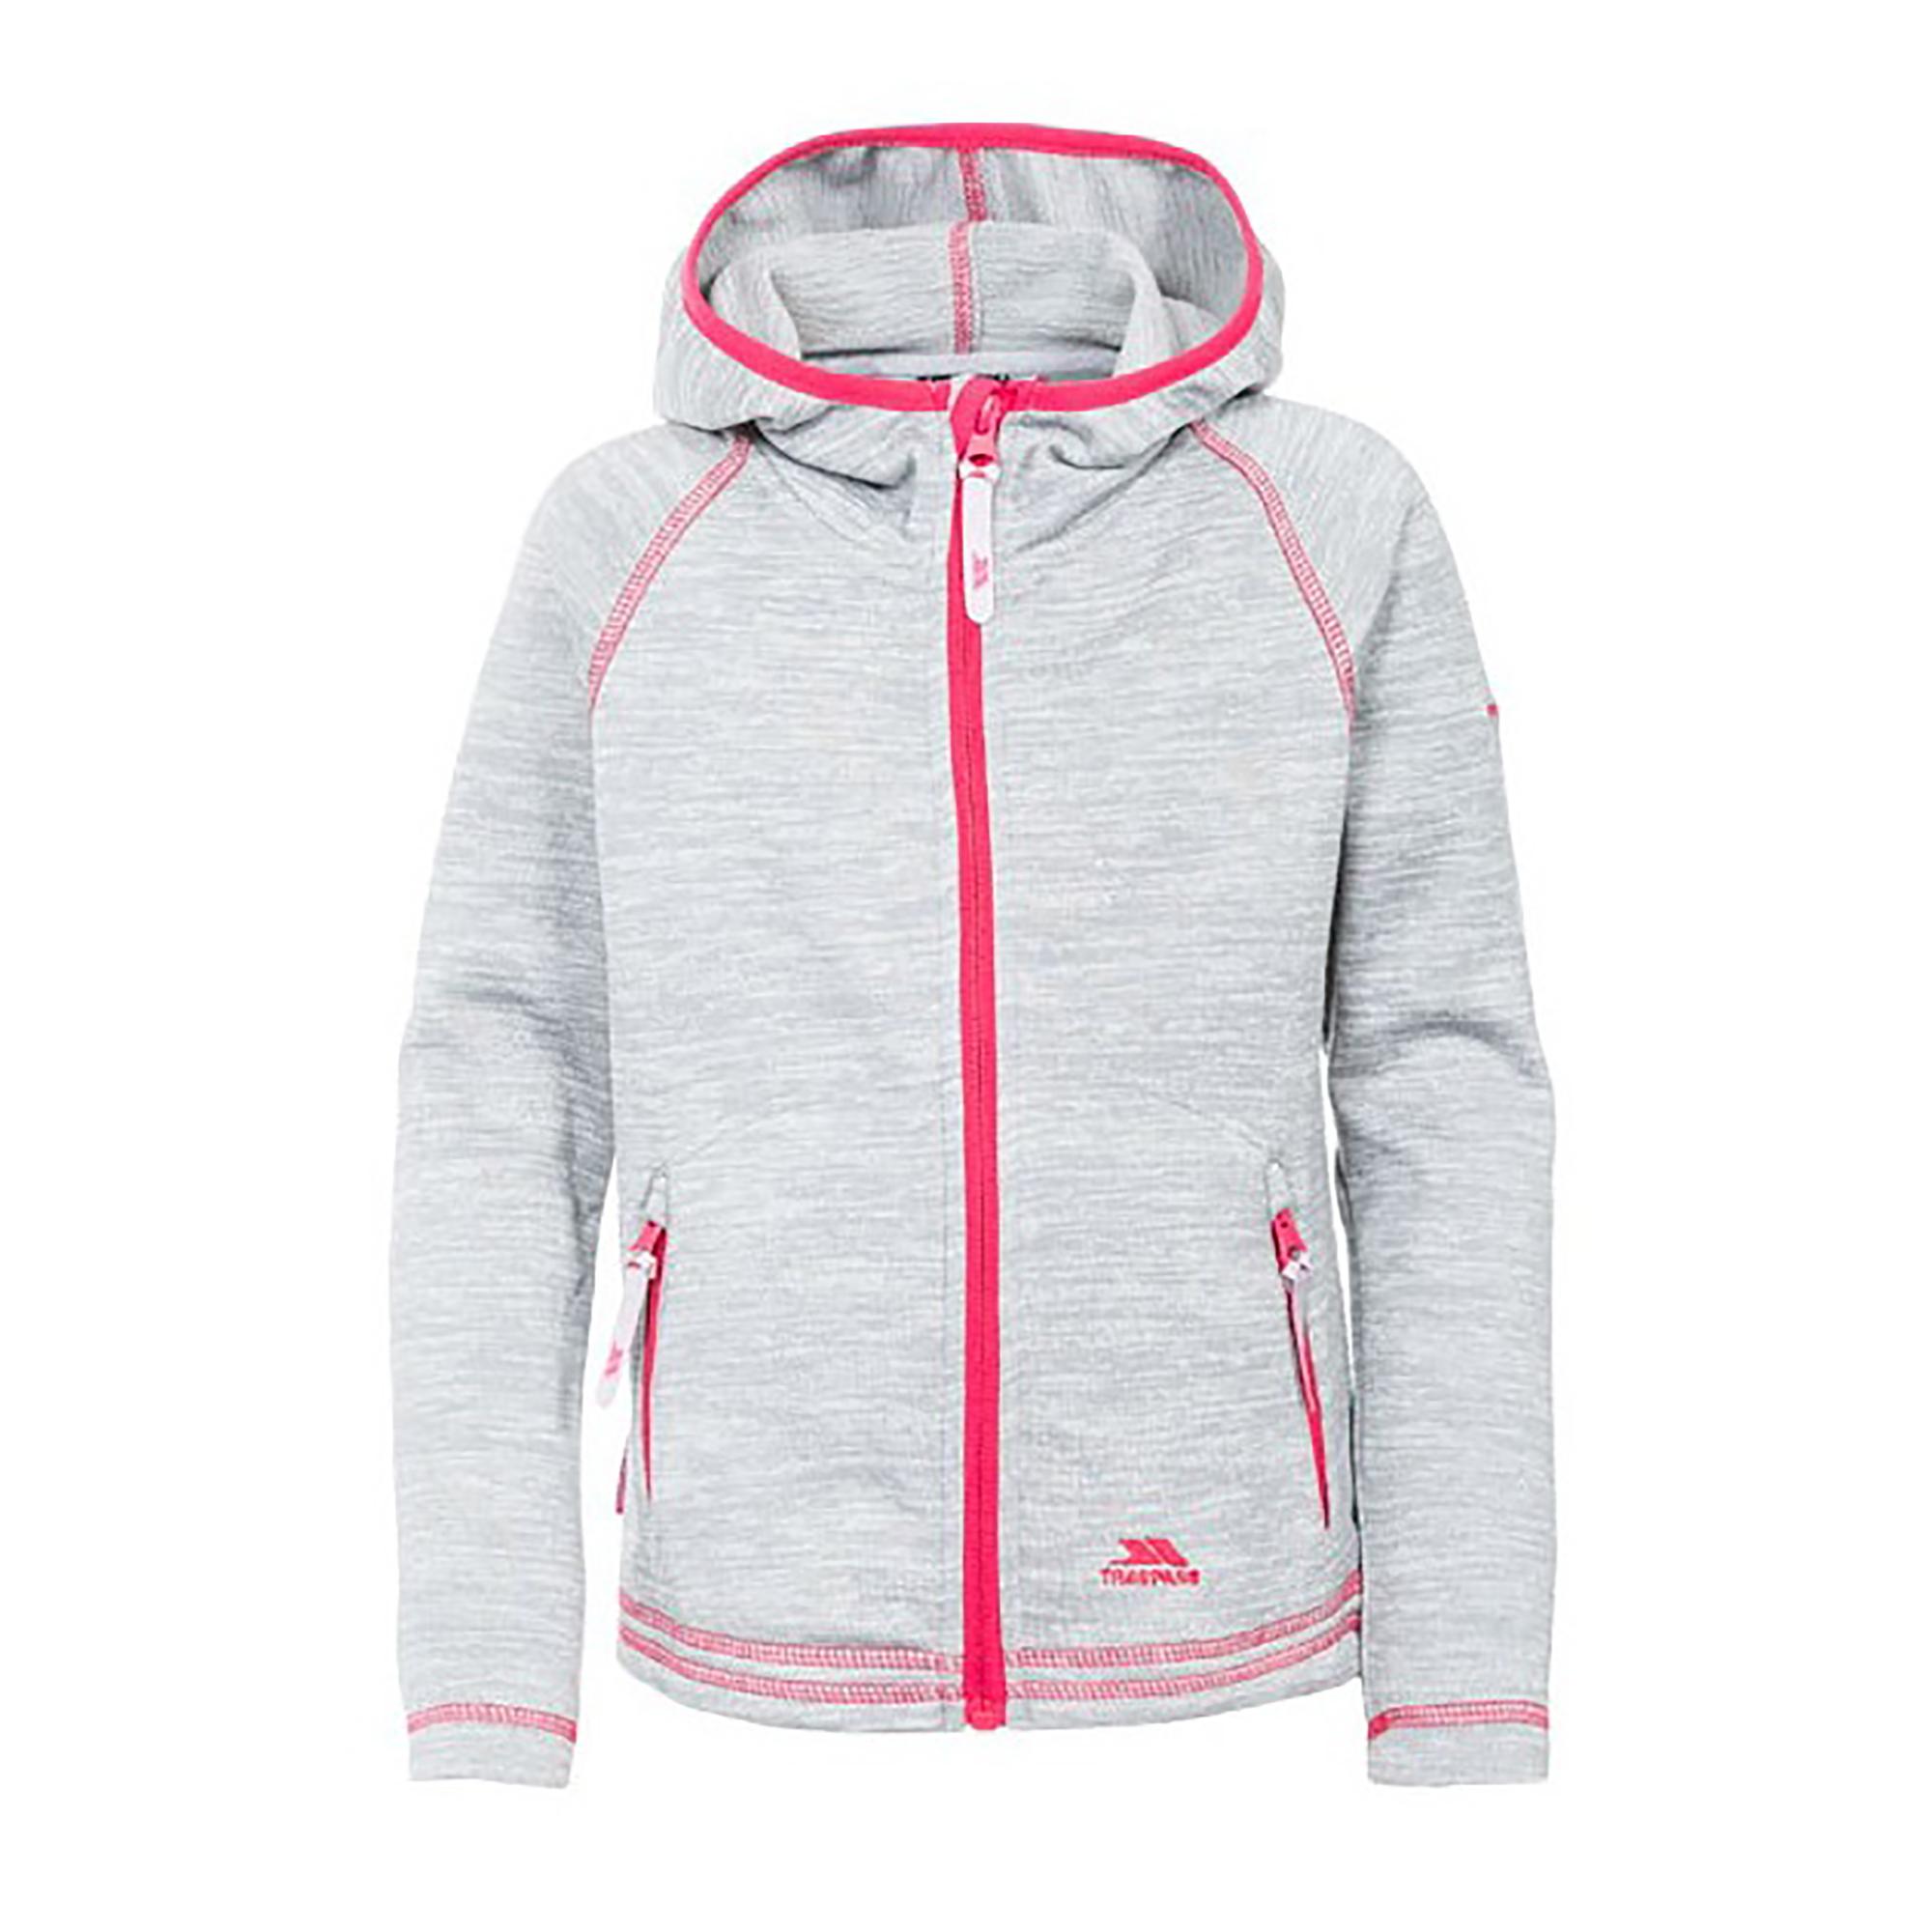 Trespass Childrens Girls Goodness Full Zip Hooded Fleece Jacket (3-4 Years) (Platinum Marl)